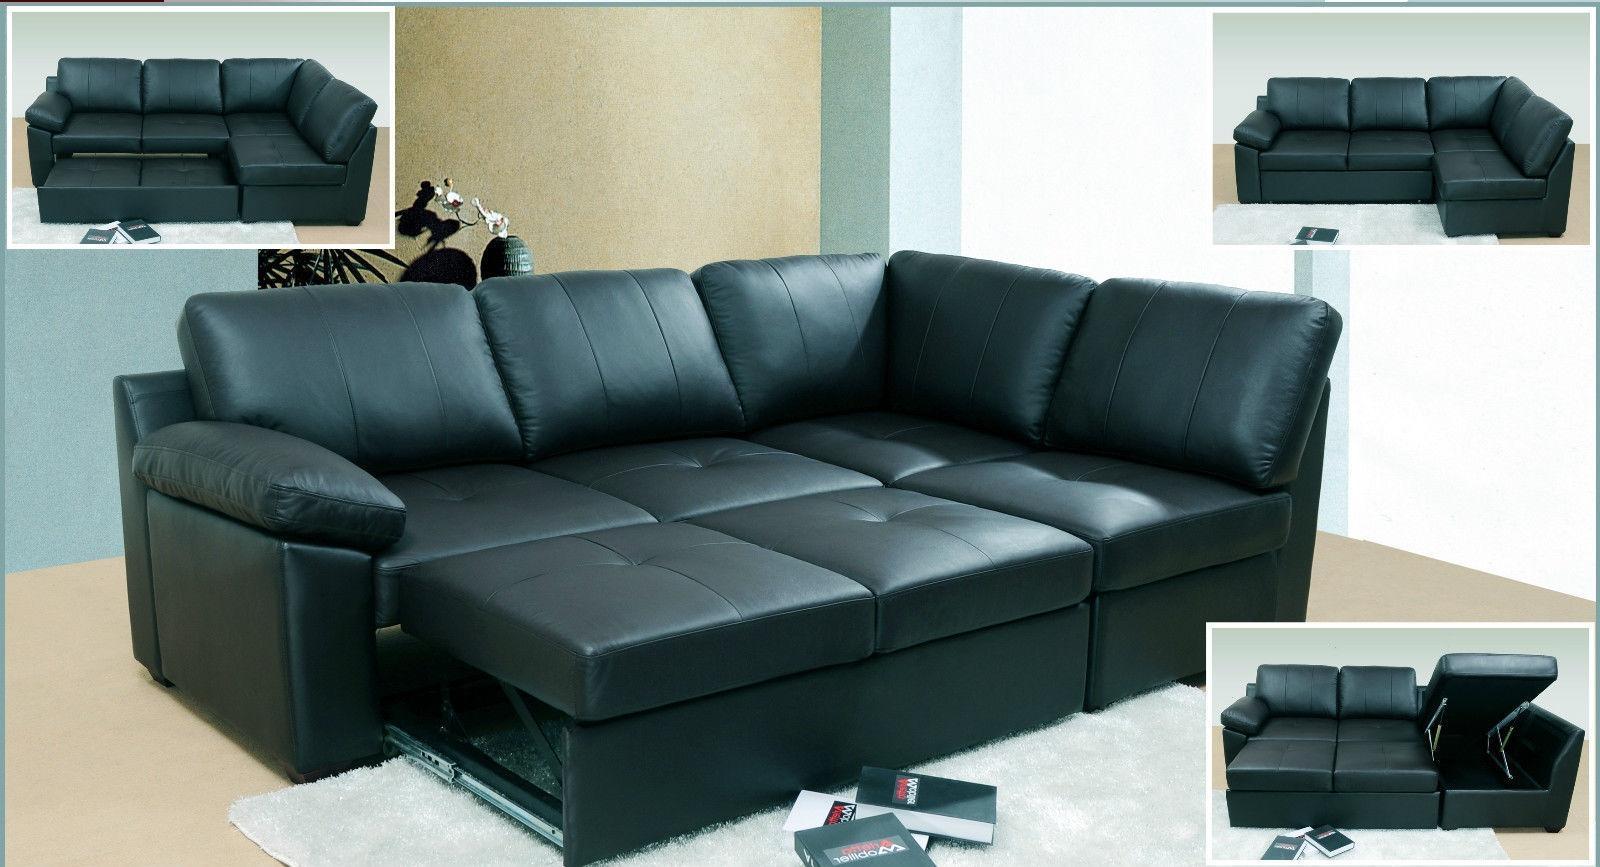 Black Leather Corner Sofa Bed With Storage • Leather Sofa Within Leather Storage Sofas (View 15 of 21)